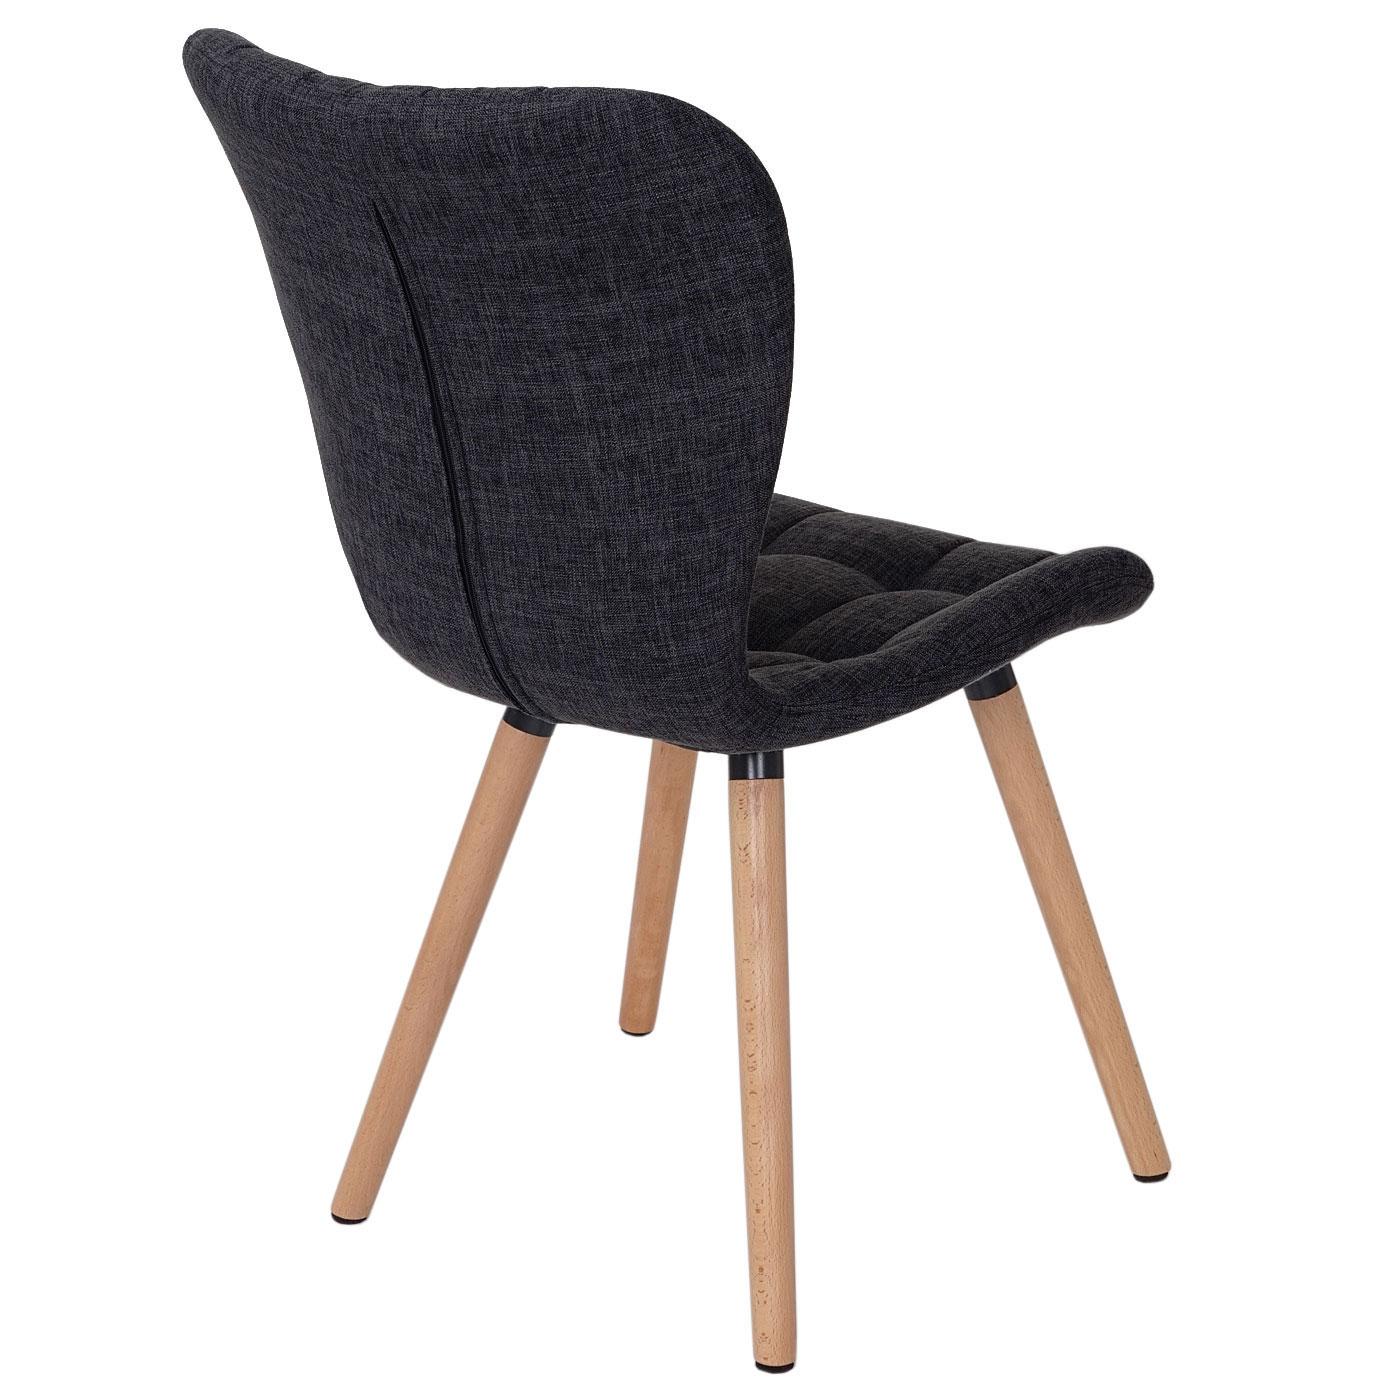 2x esszimmerstuhl hwc a87 stuhl lehnstuhl retro 50er for Stuhl designgeschichte